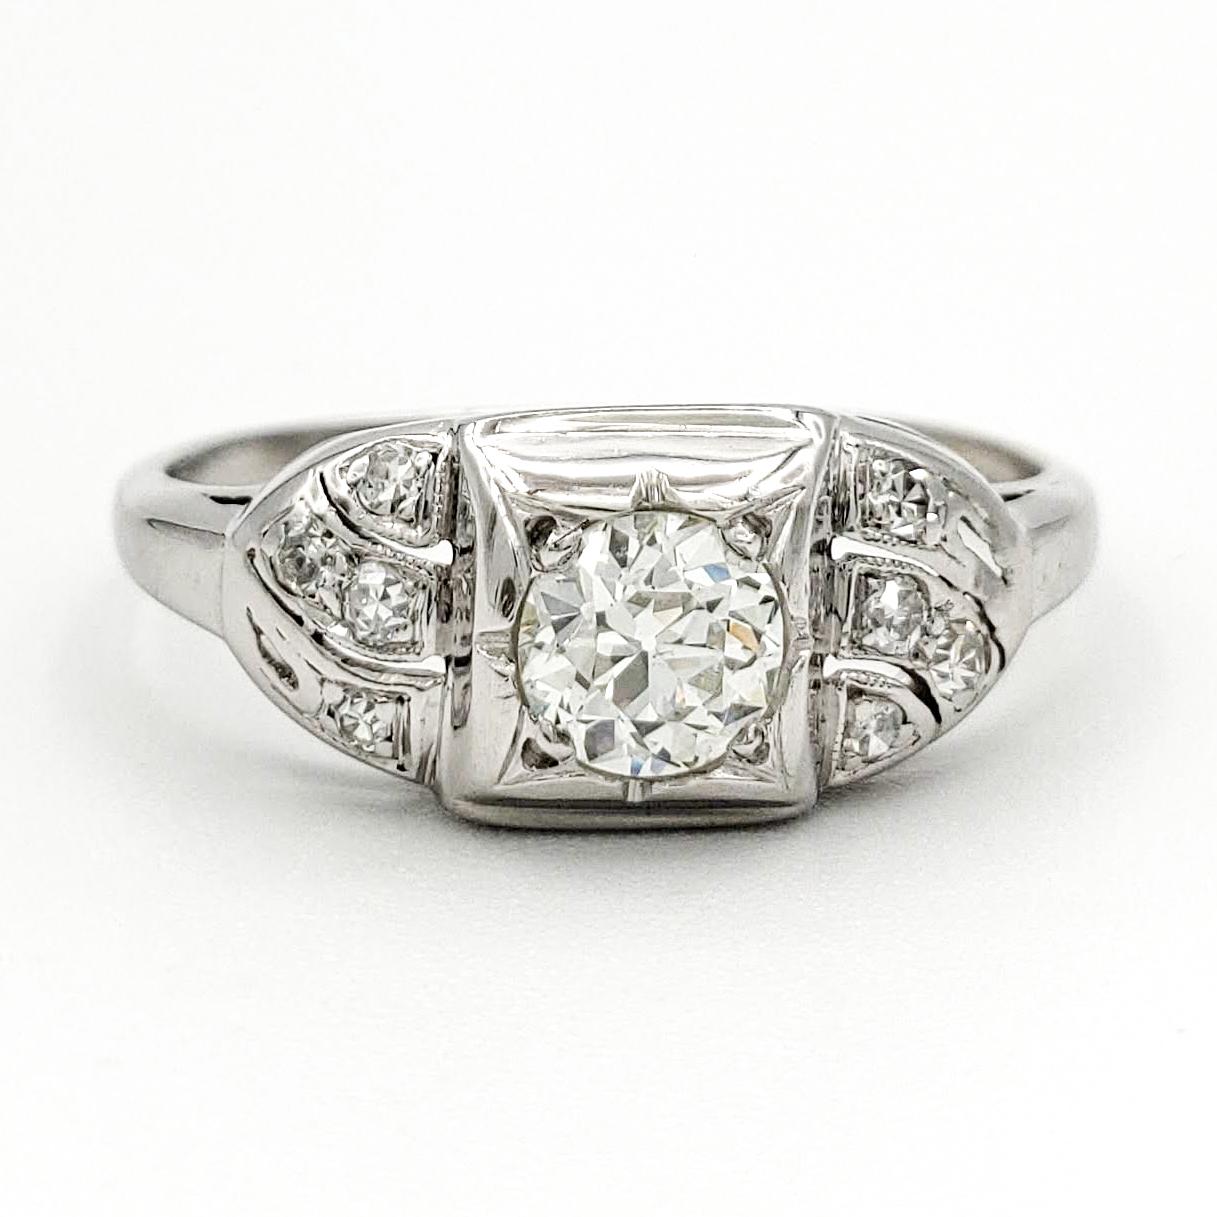 vintage-platinum-engagement-ring-with-0-41-carat-old-european-cut-diamond-egl-i-vs2